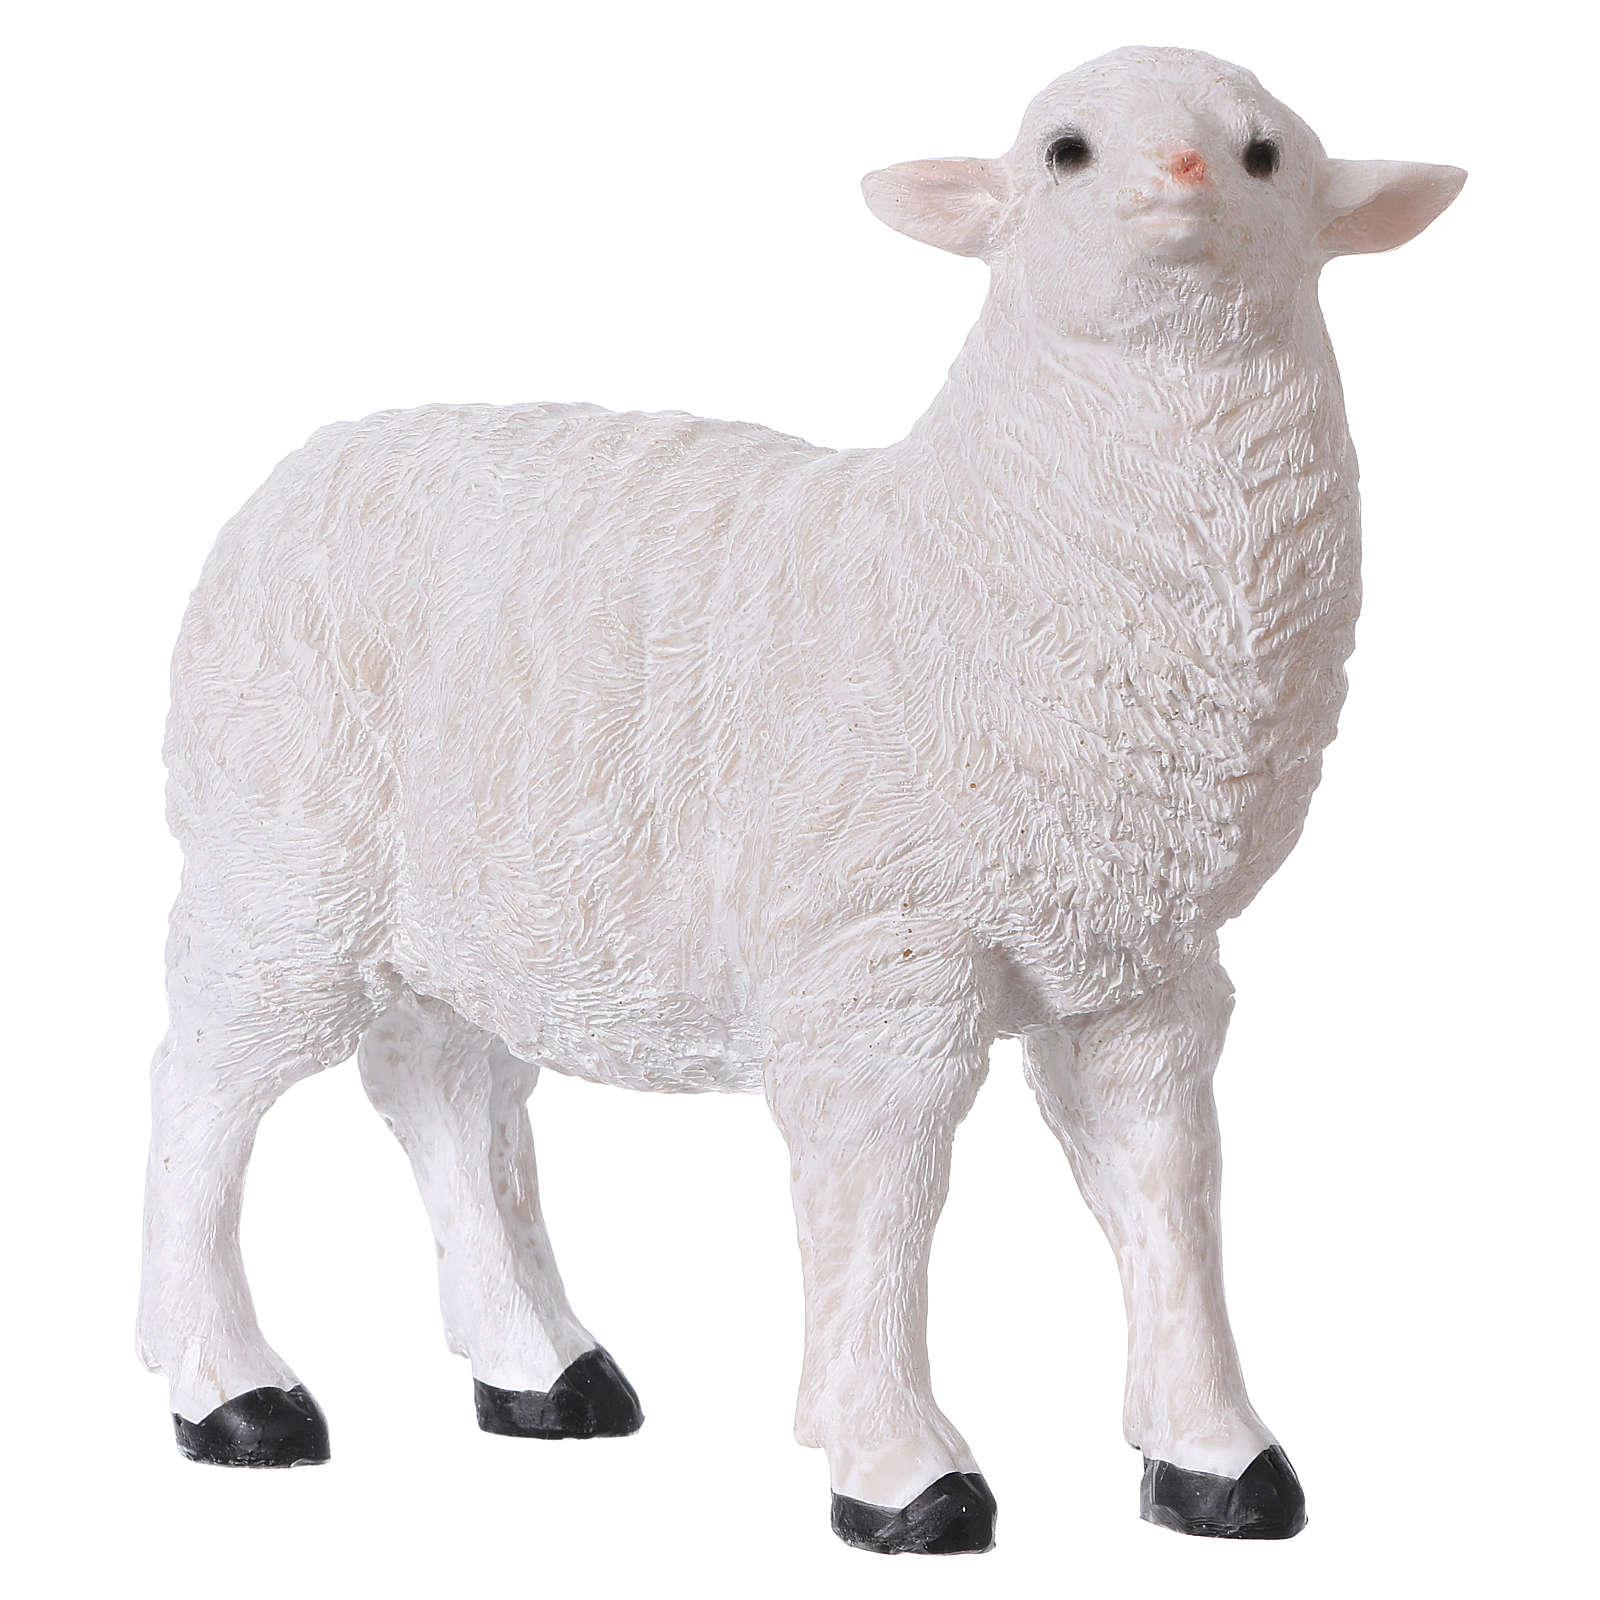 Set of 2 resin sheep for Nativity scenes 35-45 cm 3